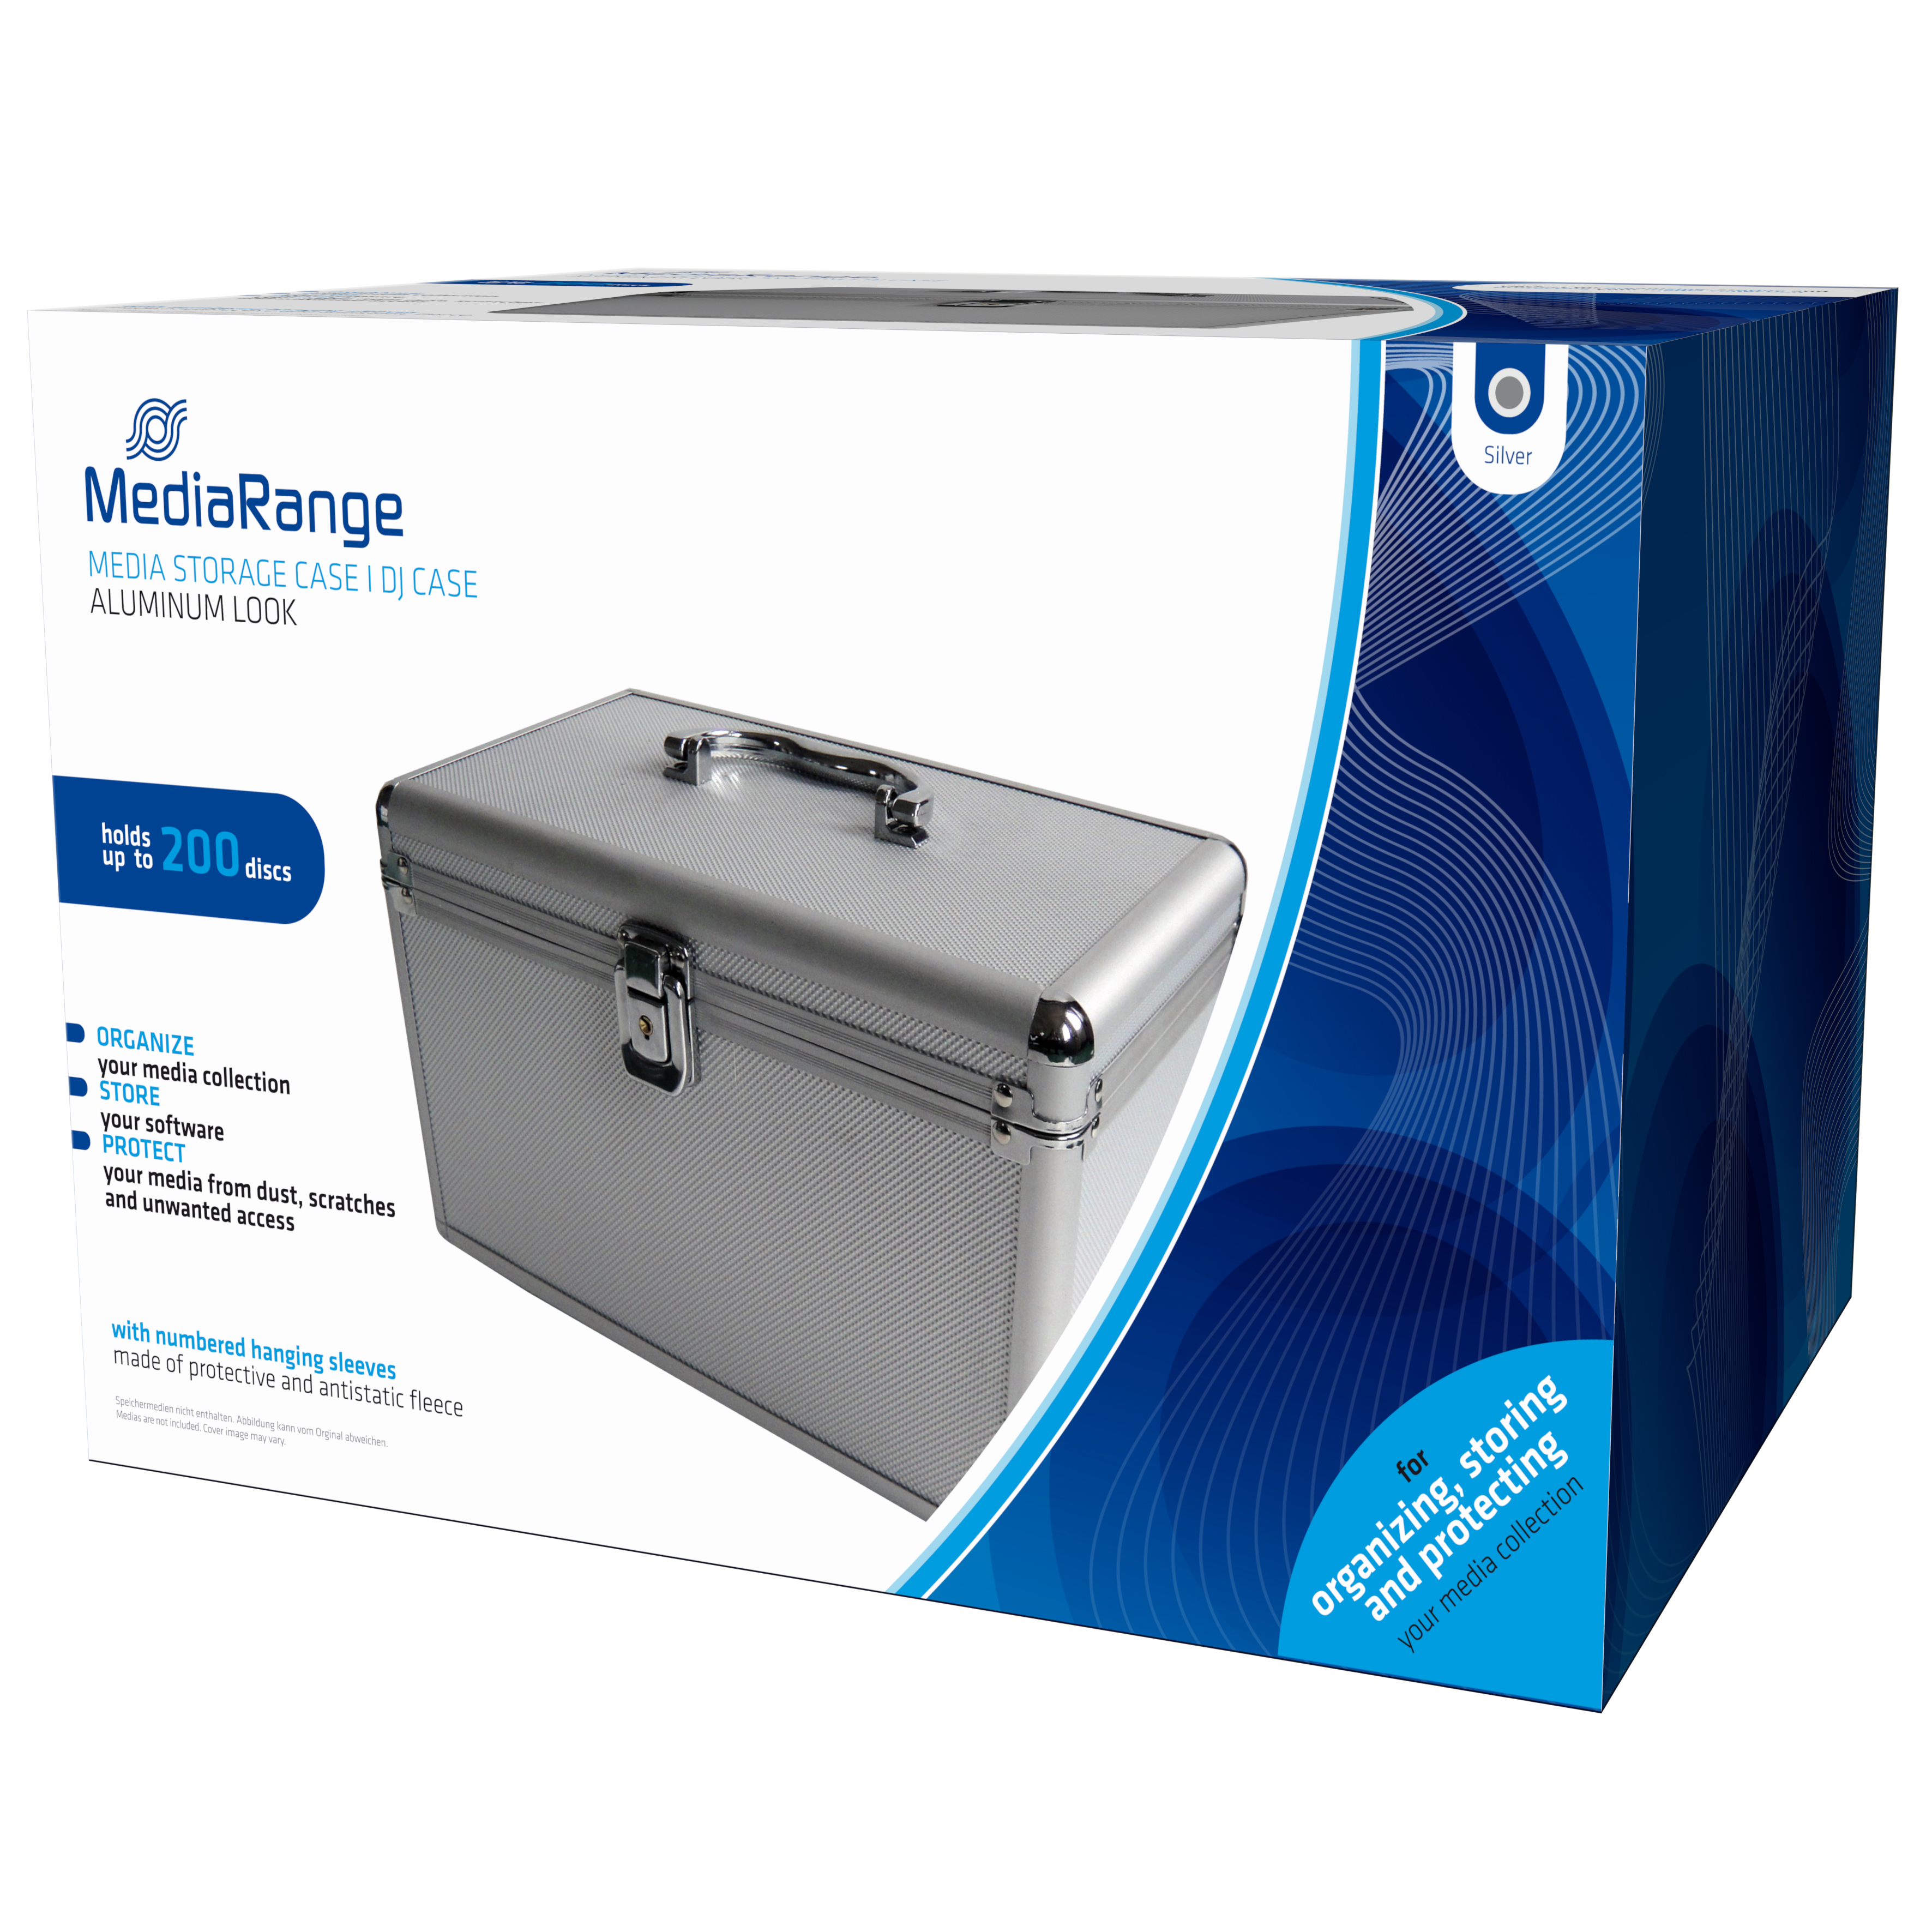 MEDIARANGE BOX75 - Gehäusebox - 200 Disks - Silber - Fleece - Kunststoff - Holz - 120 mm - Aluminium